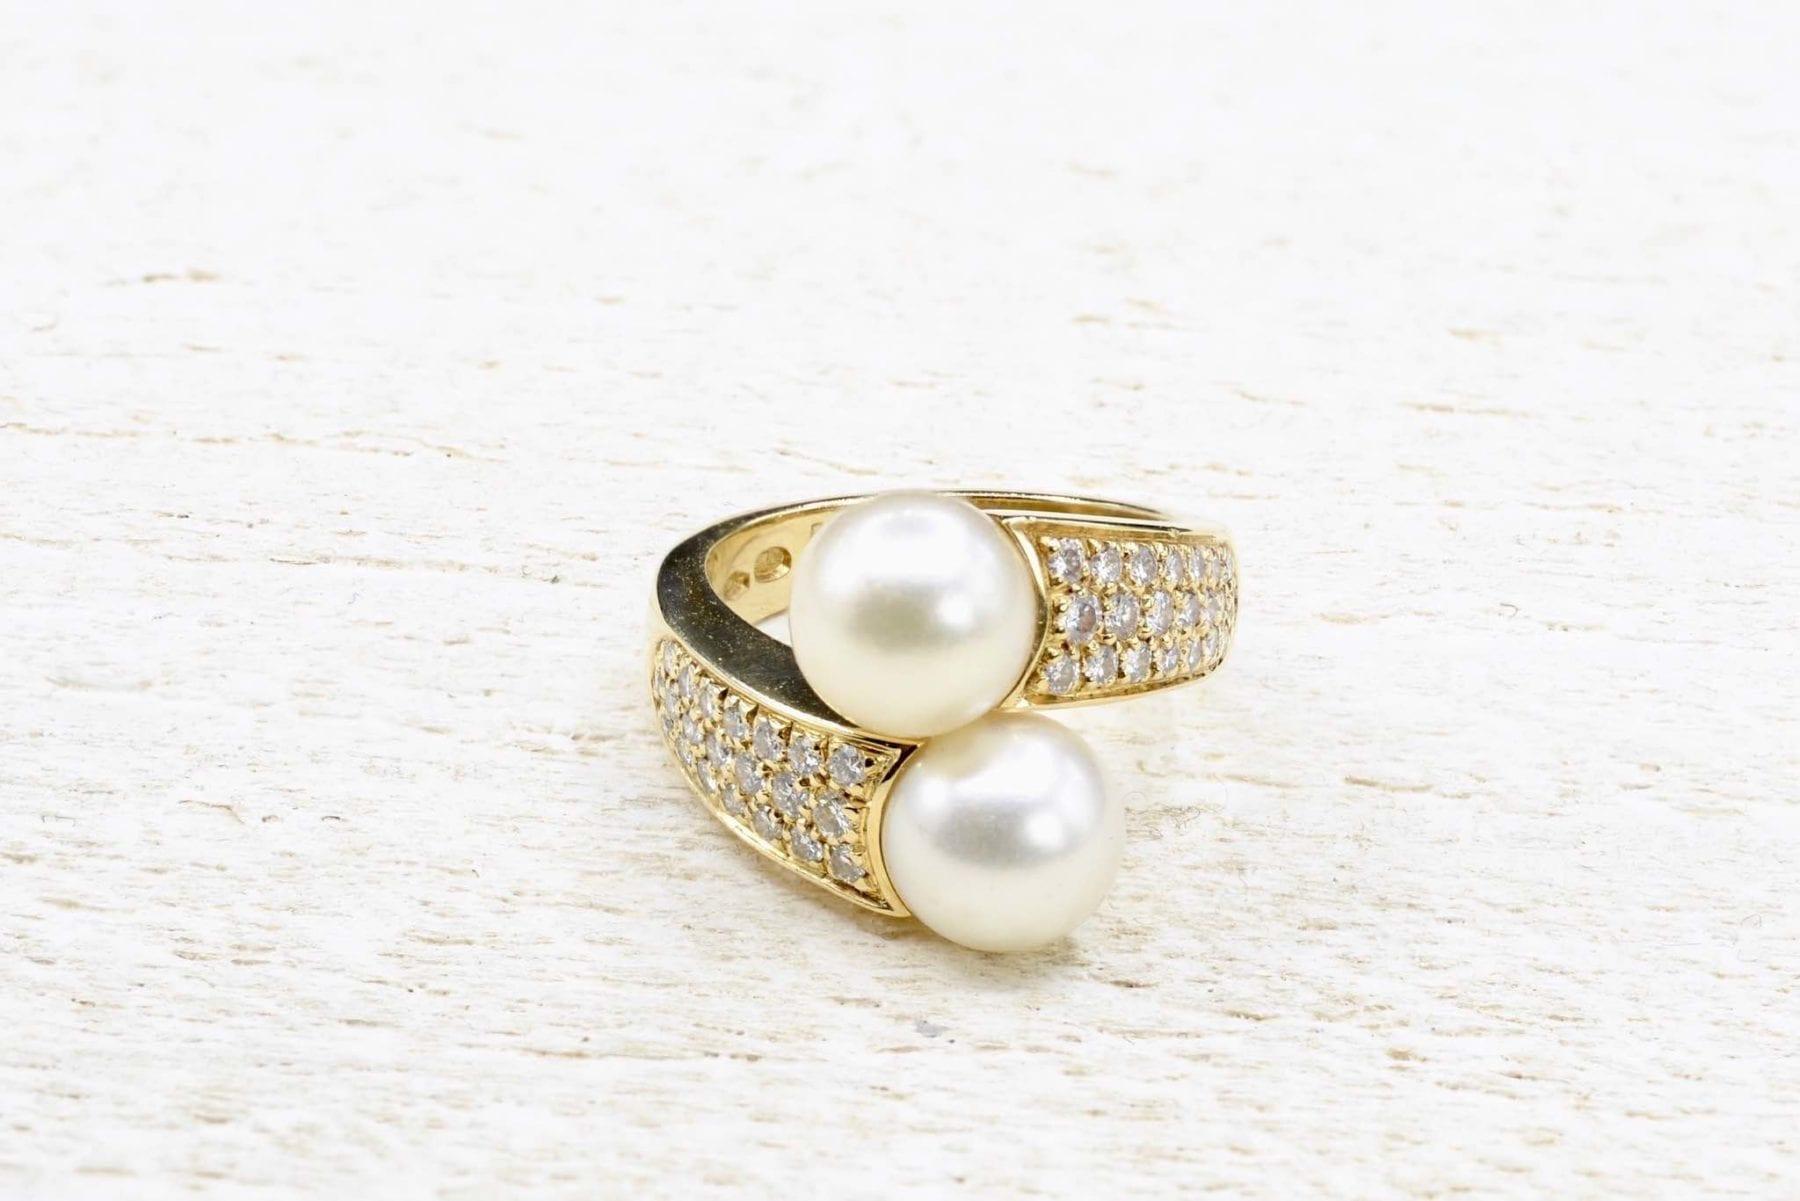 bague perles et diamants or